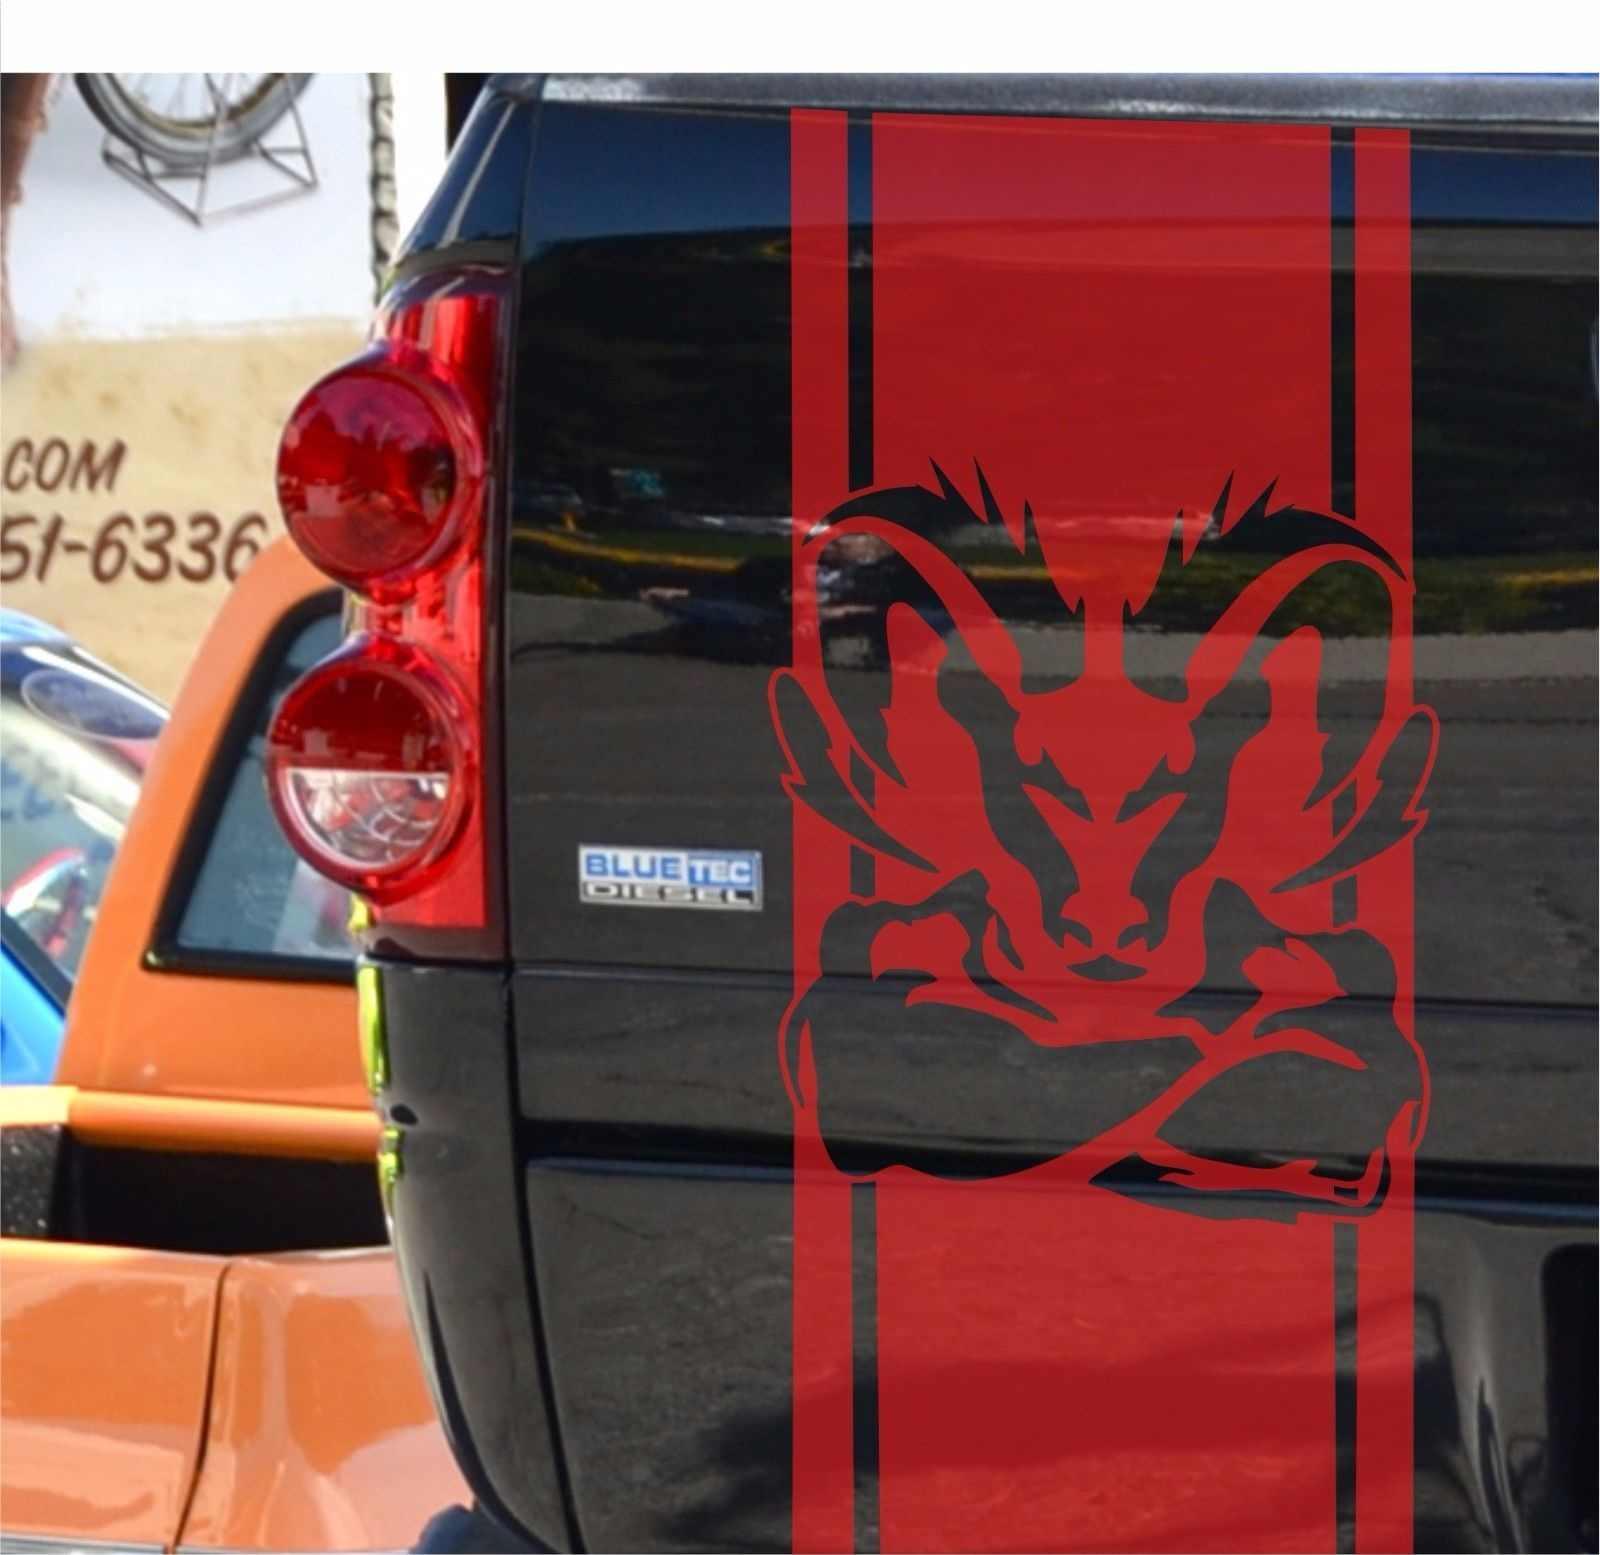 For 2pcs Dodge Ram 1500 5 7 L Vinyl Sticker Tailgate Decal Stripe Mopar Rebel Hemi Logo Car Stickers Aliexpress